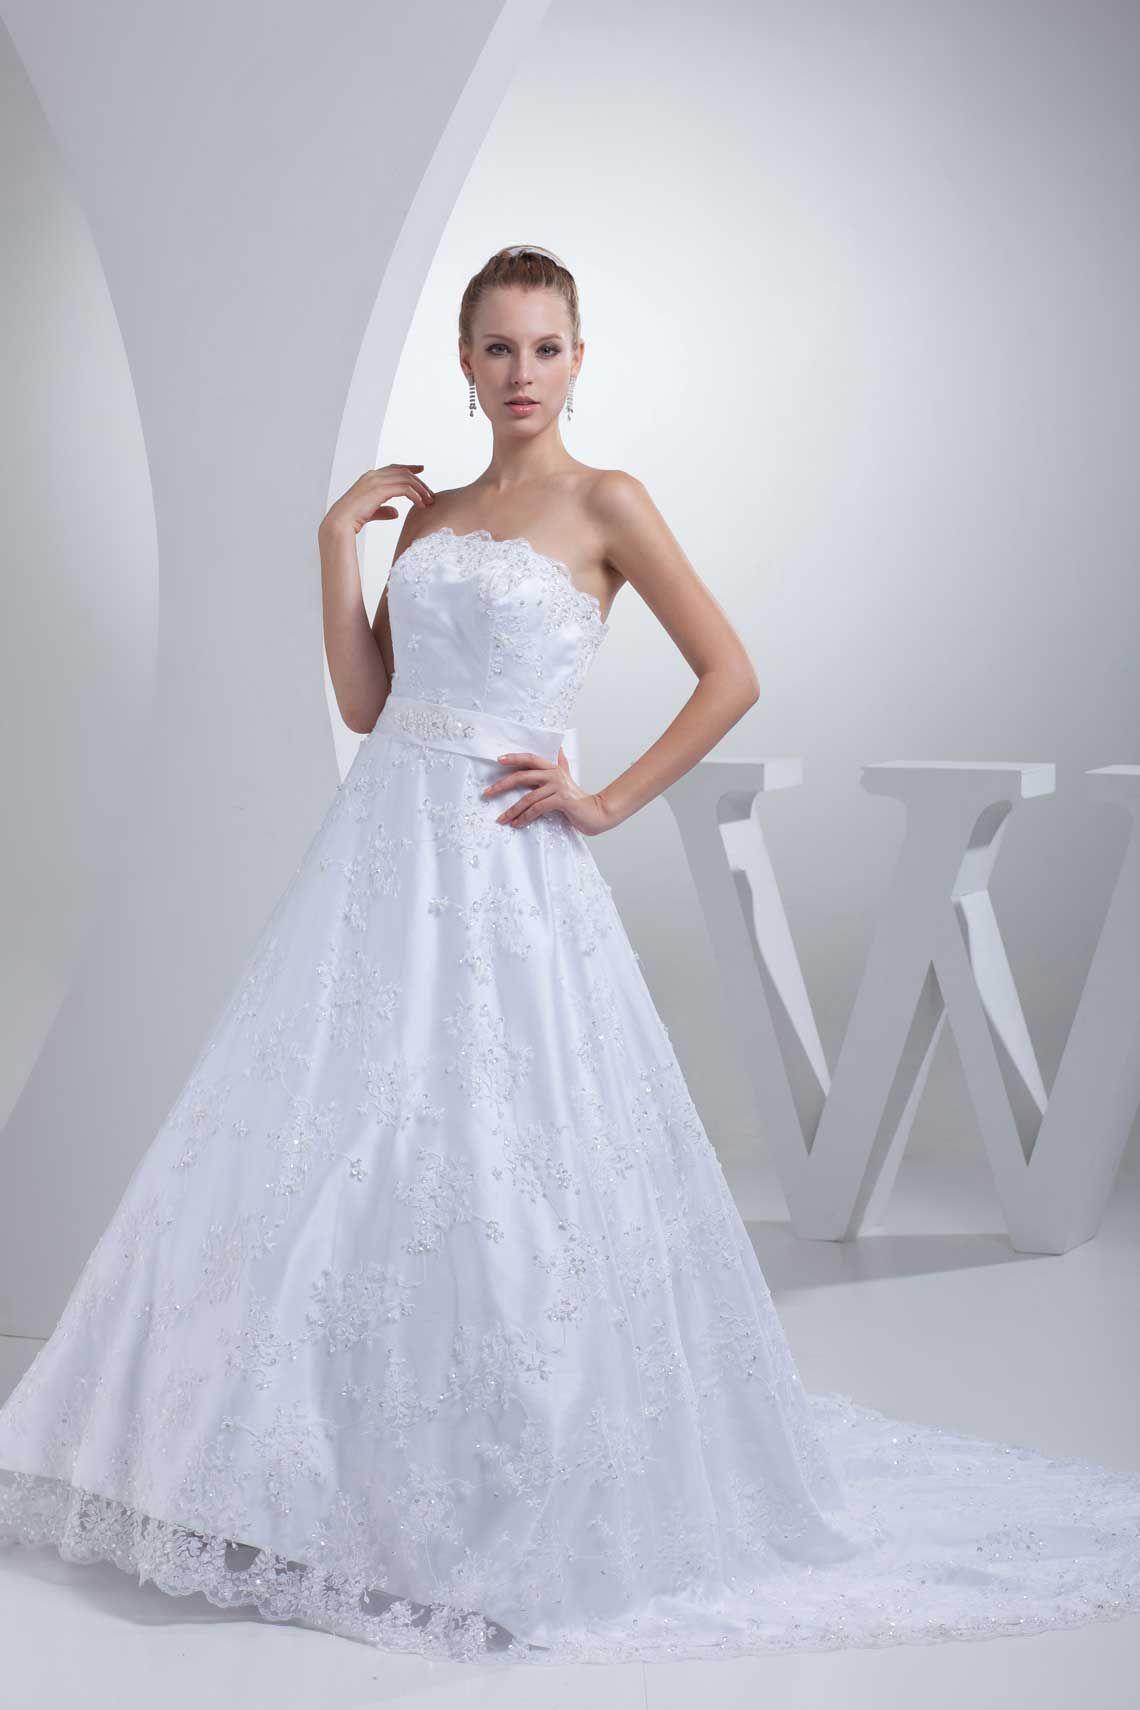 Satin natural waist chapel train lace zipper bowknot wedding dress